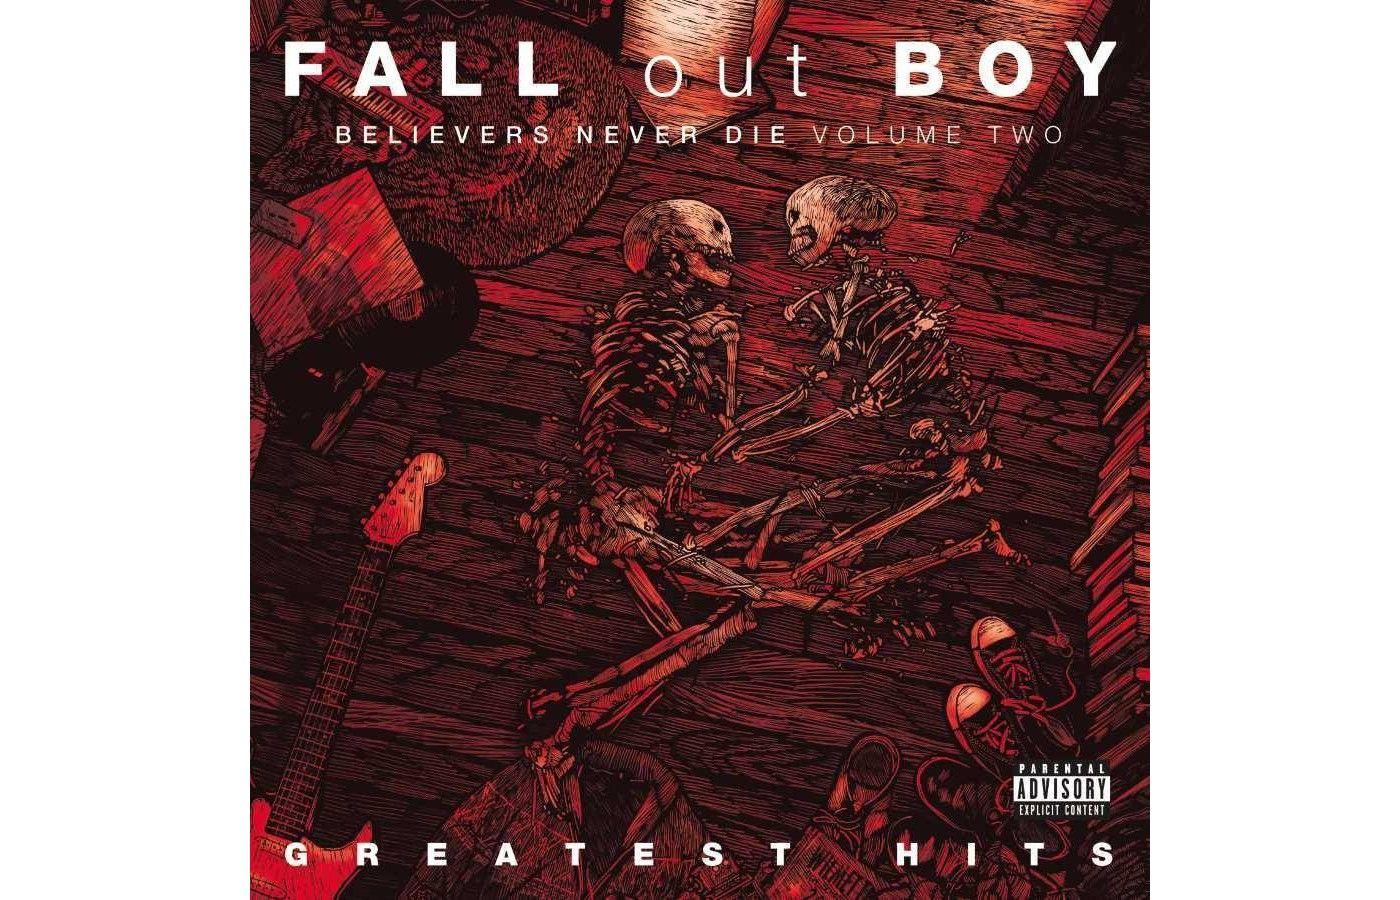 Fall Out Boy – Believers Never Die, Vol. 2 [Explicit Lyrics] (CD) 4K